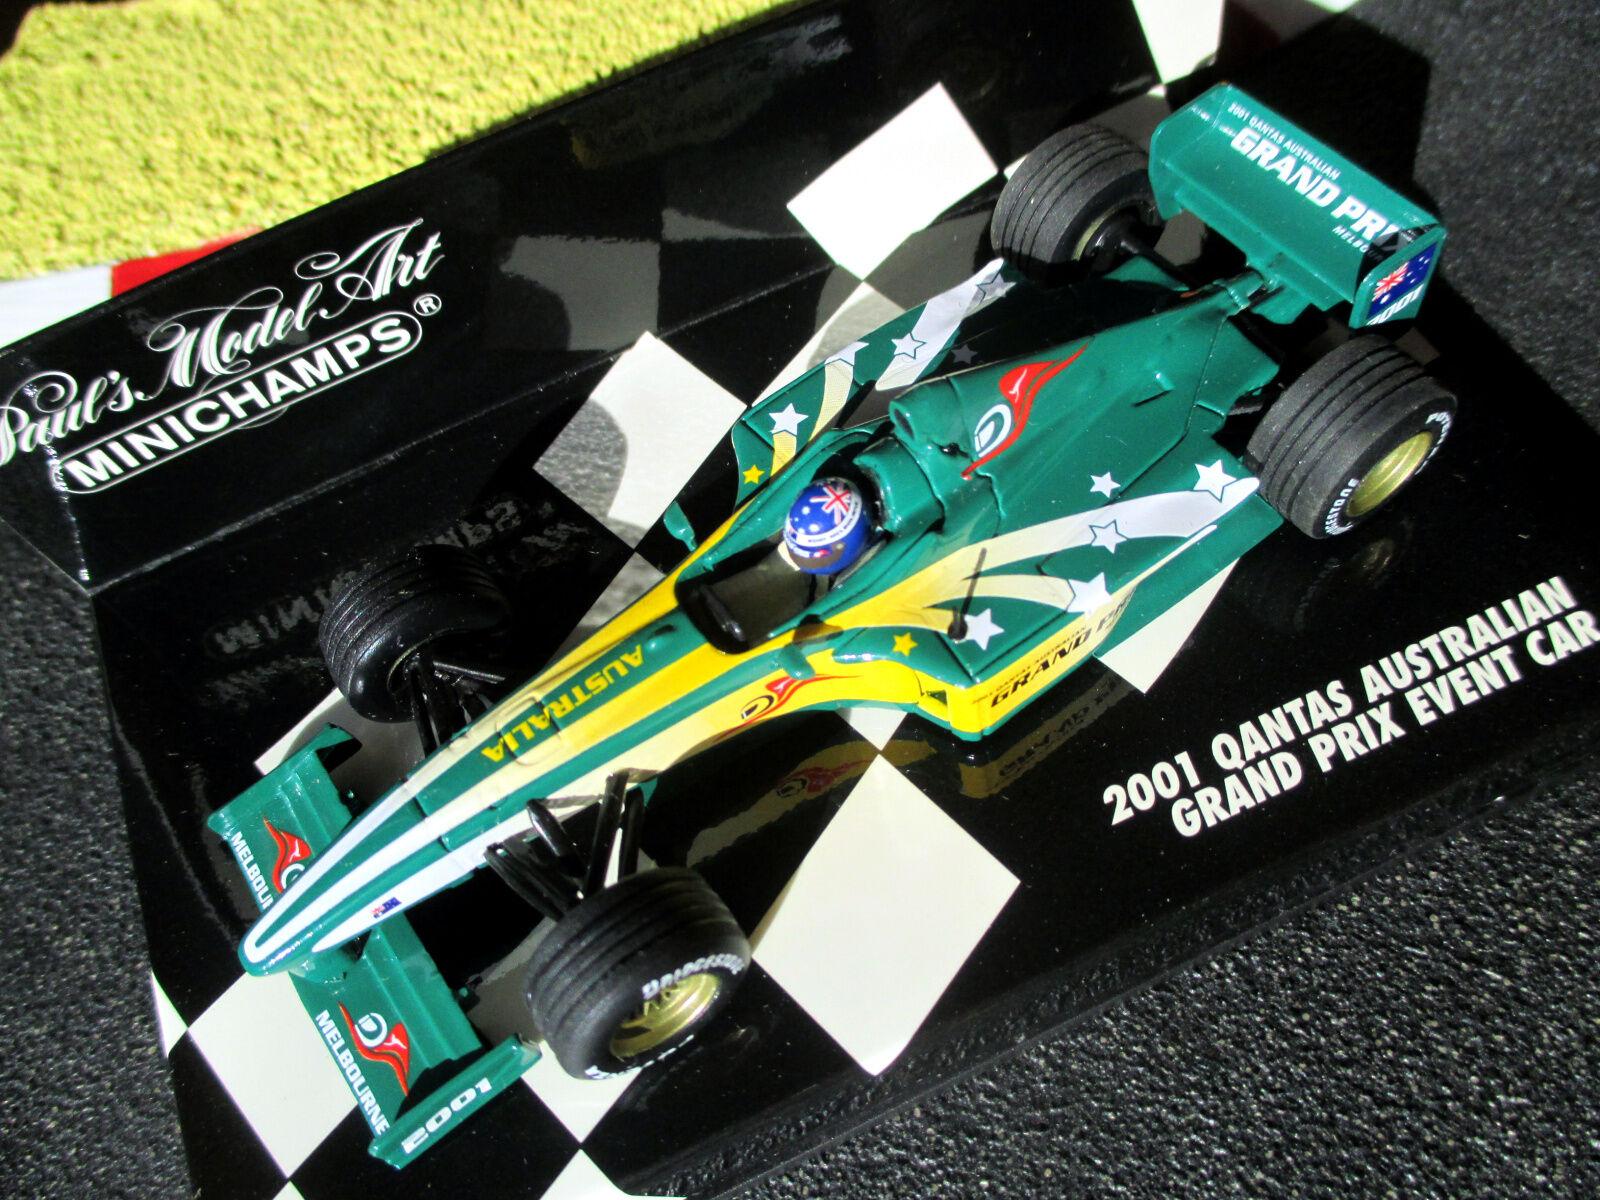 1 43 quanta Australian Grand prix Event voiture 2001 Minichamps  ac4 010300 OVP  design unique